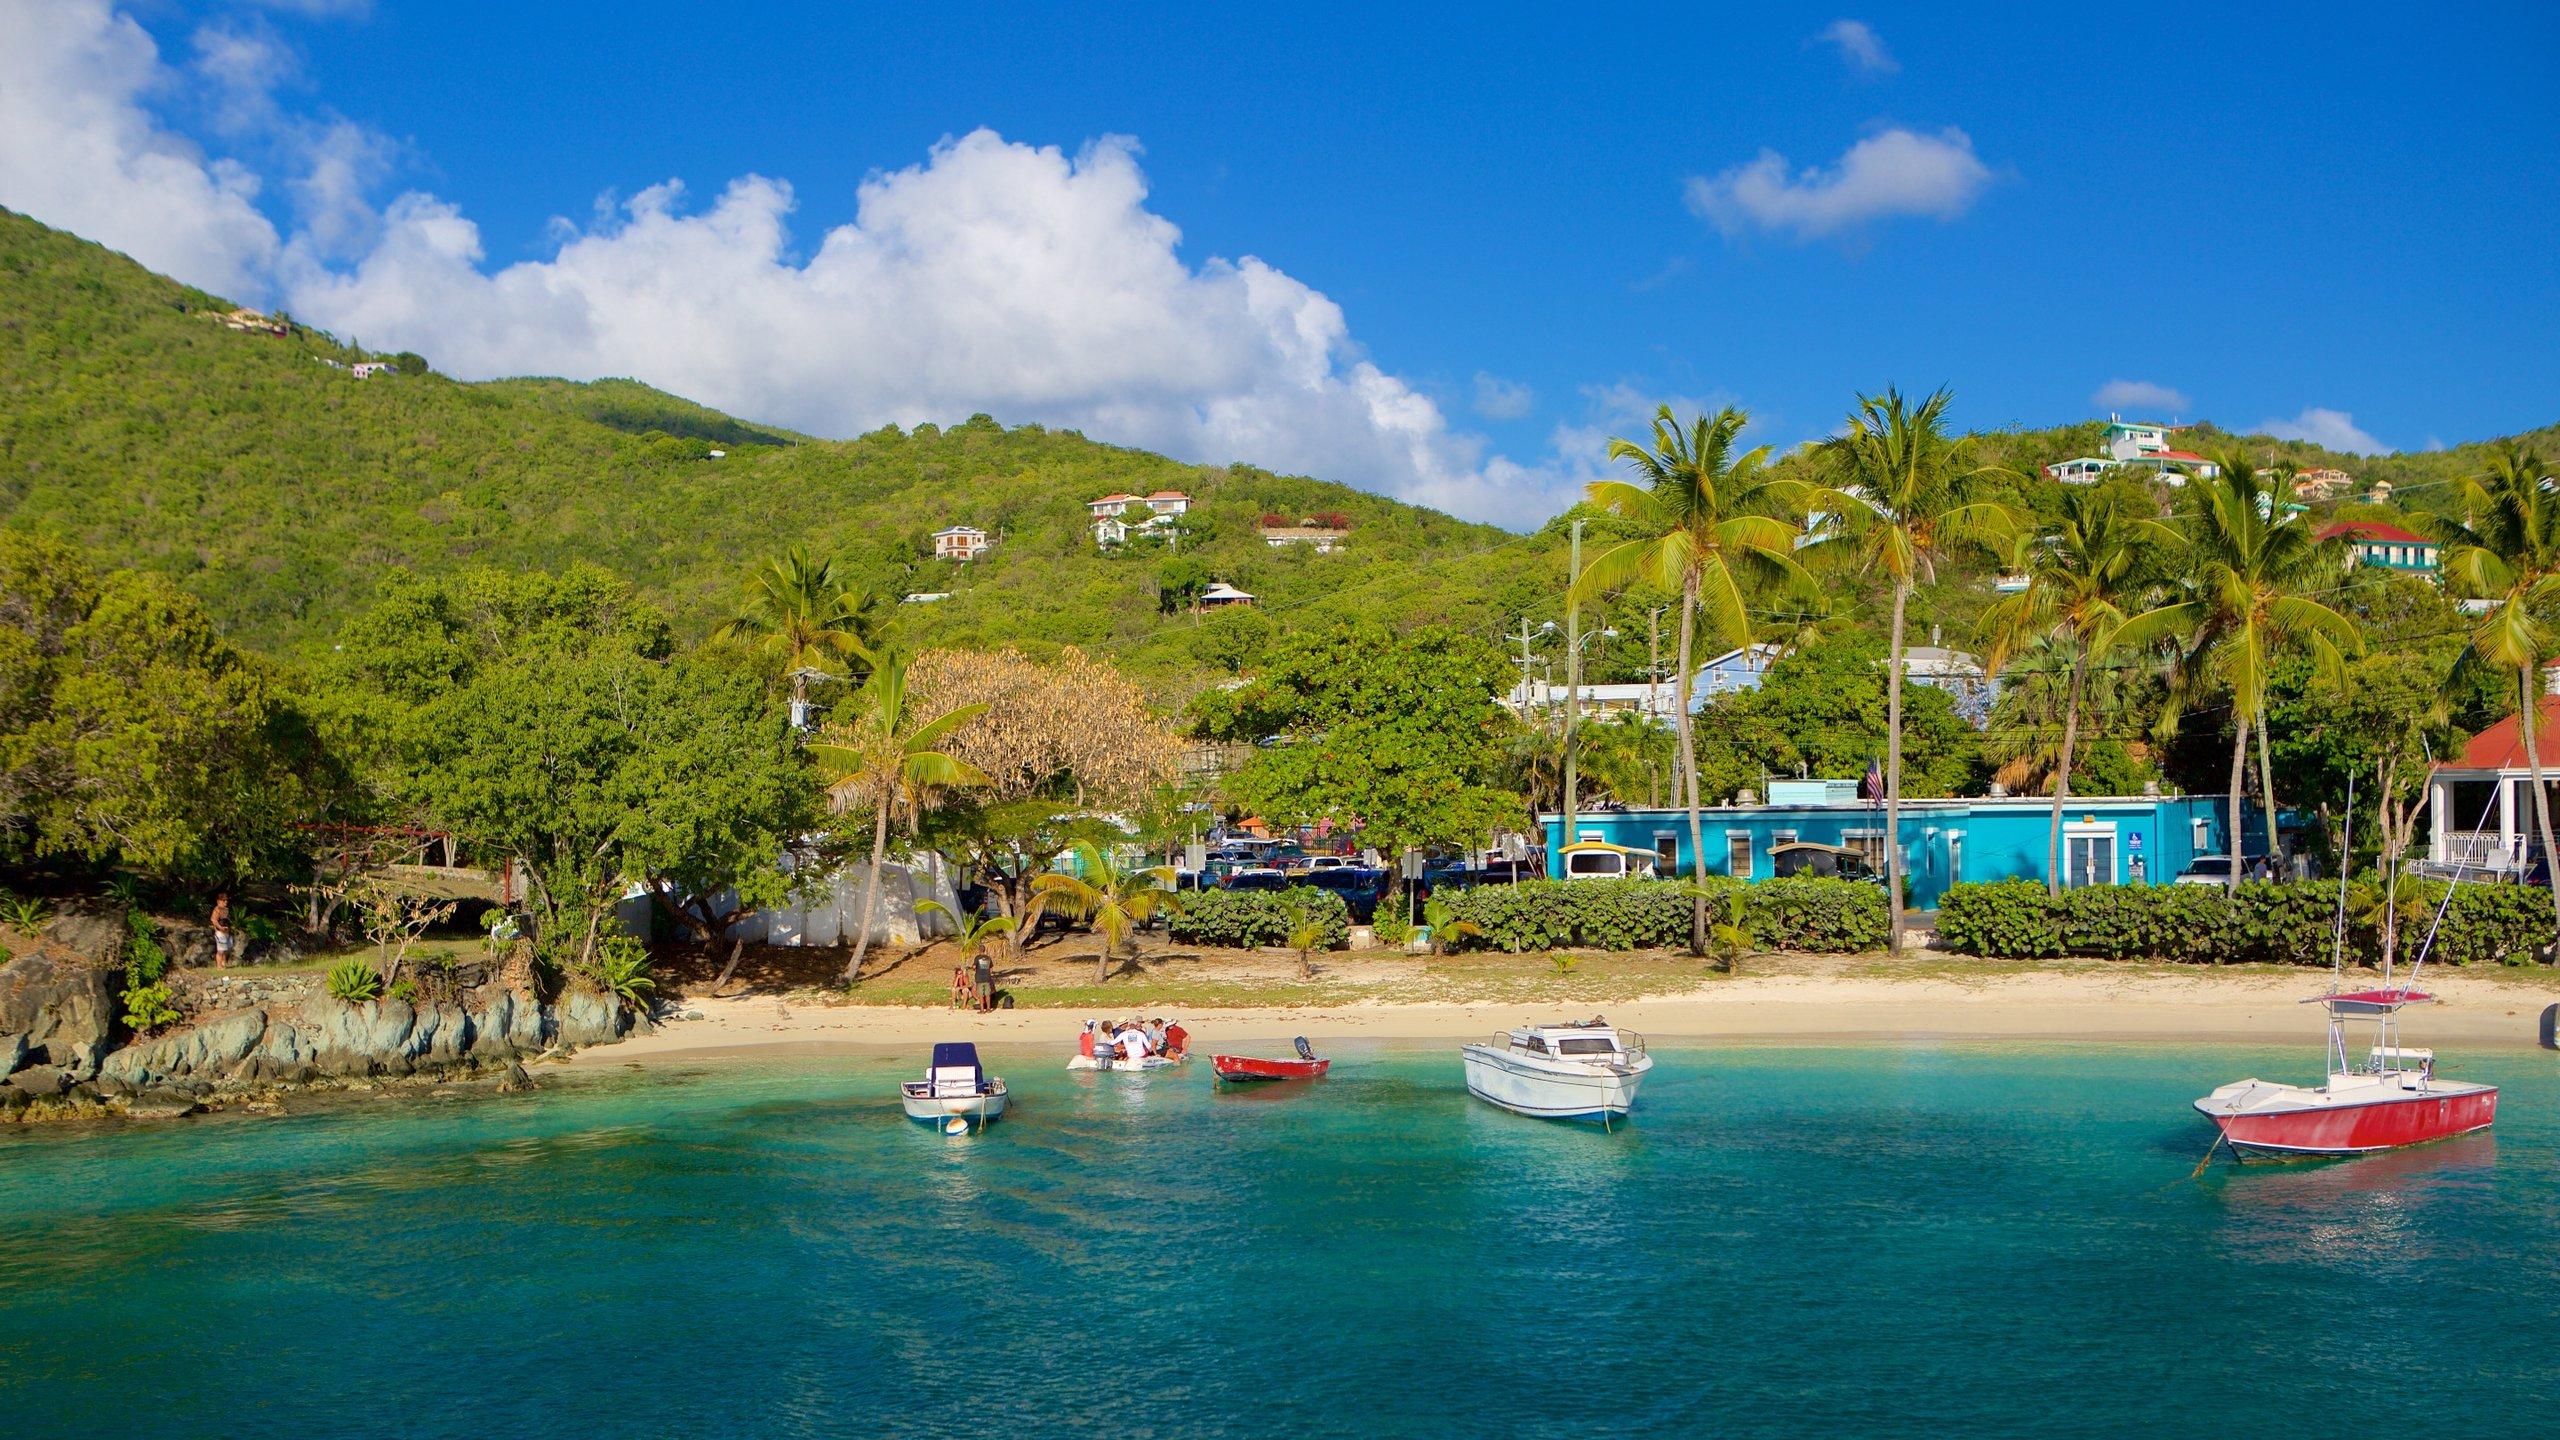 Estate Smith Bay, St. Thomas, U.S. Virgin Islands